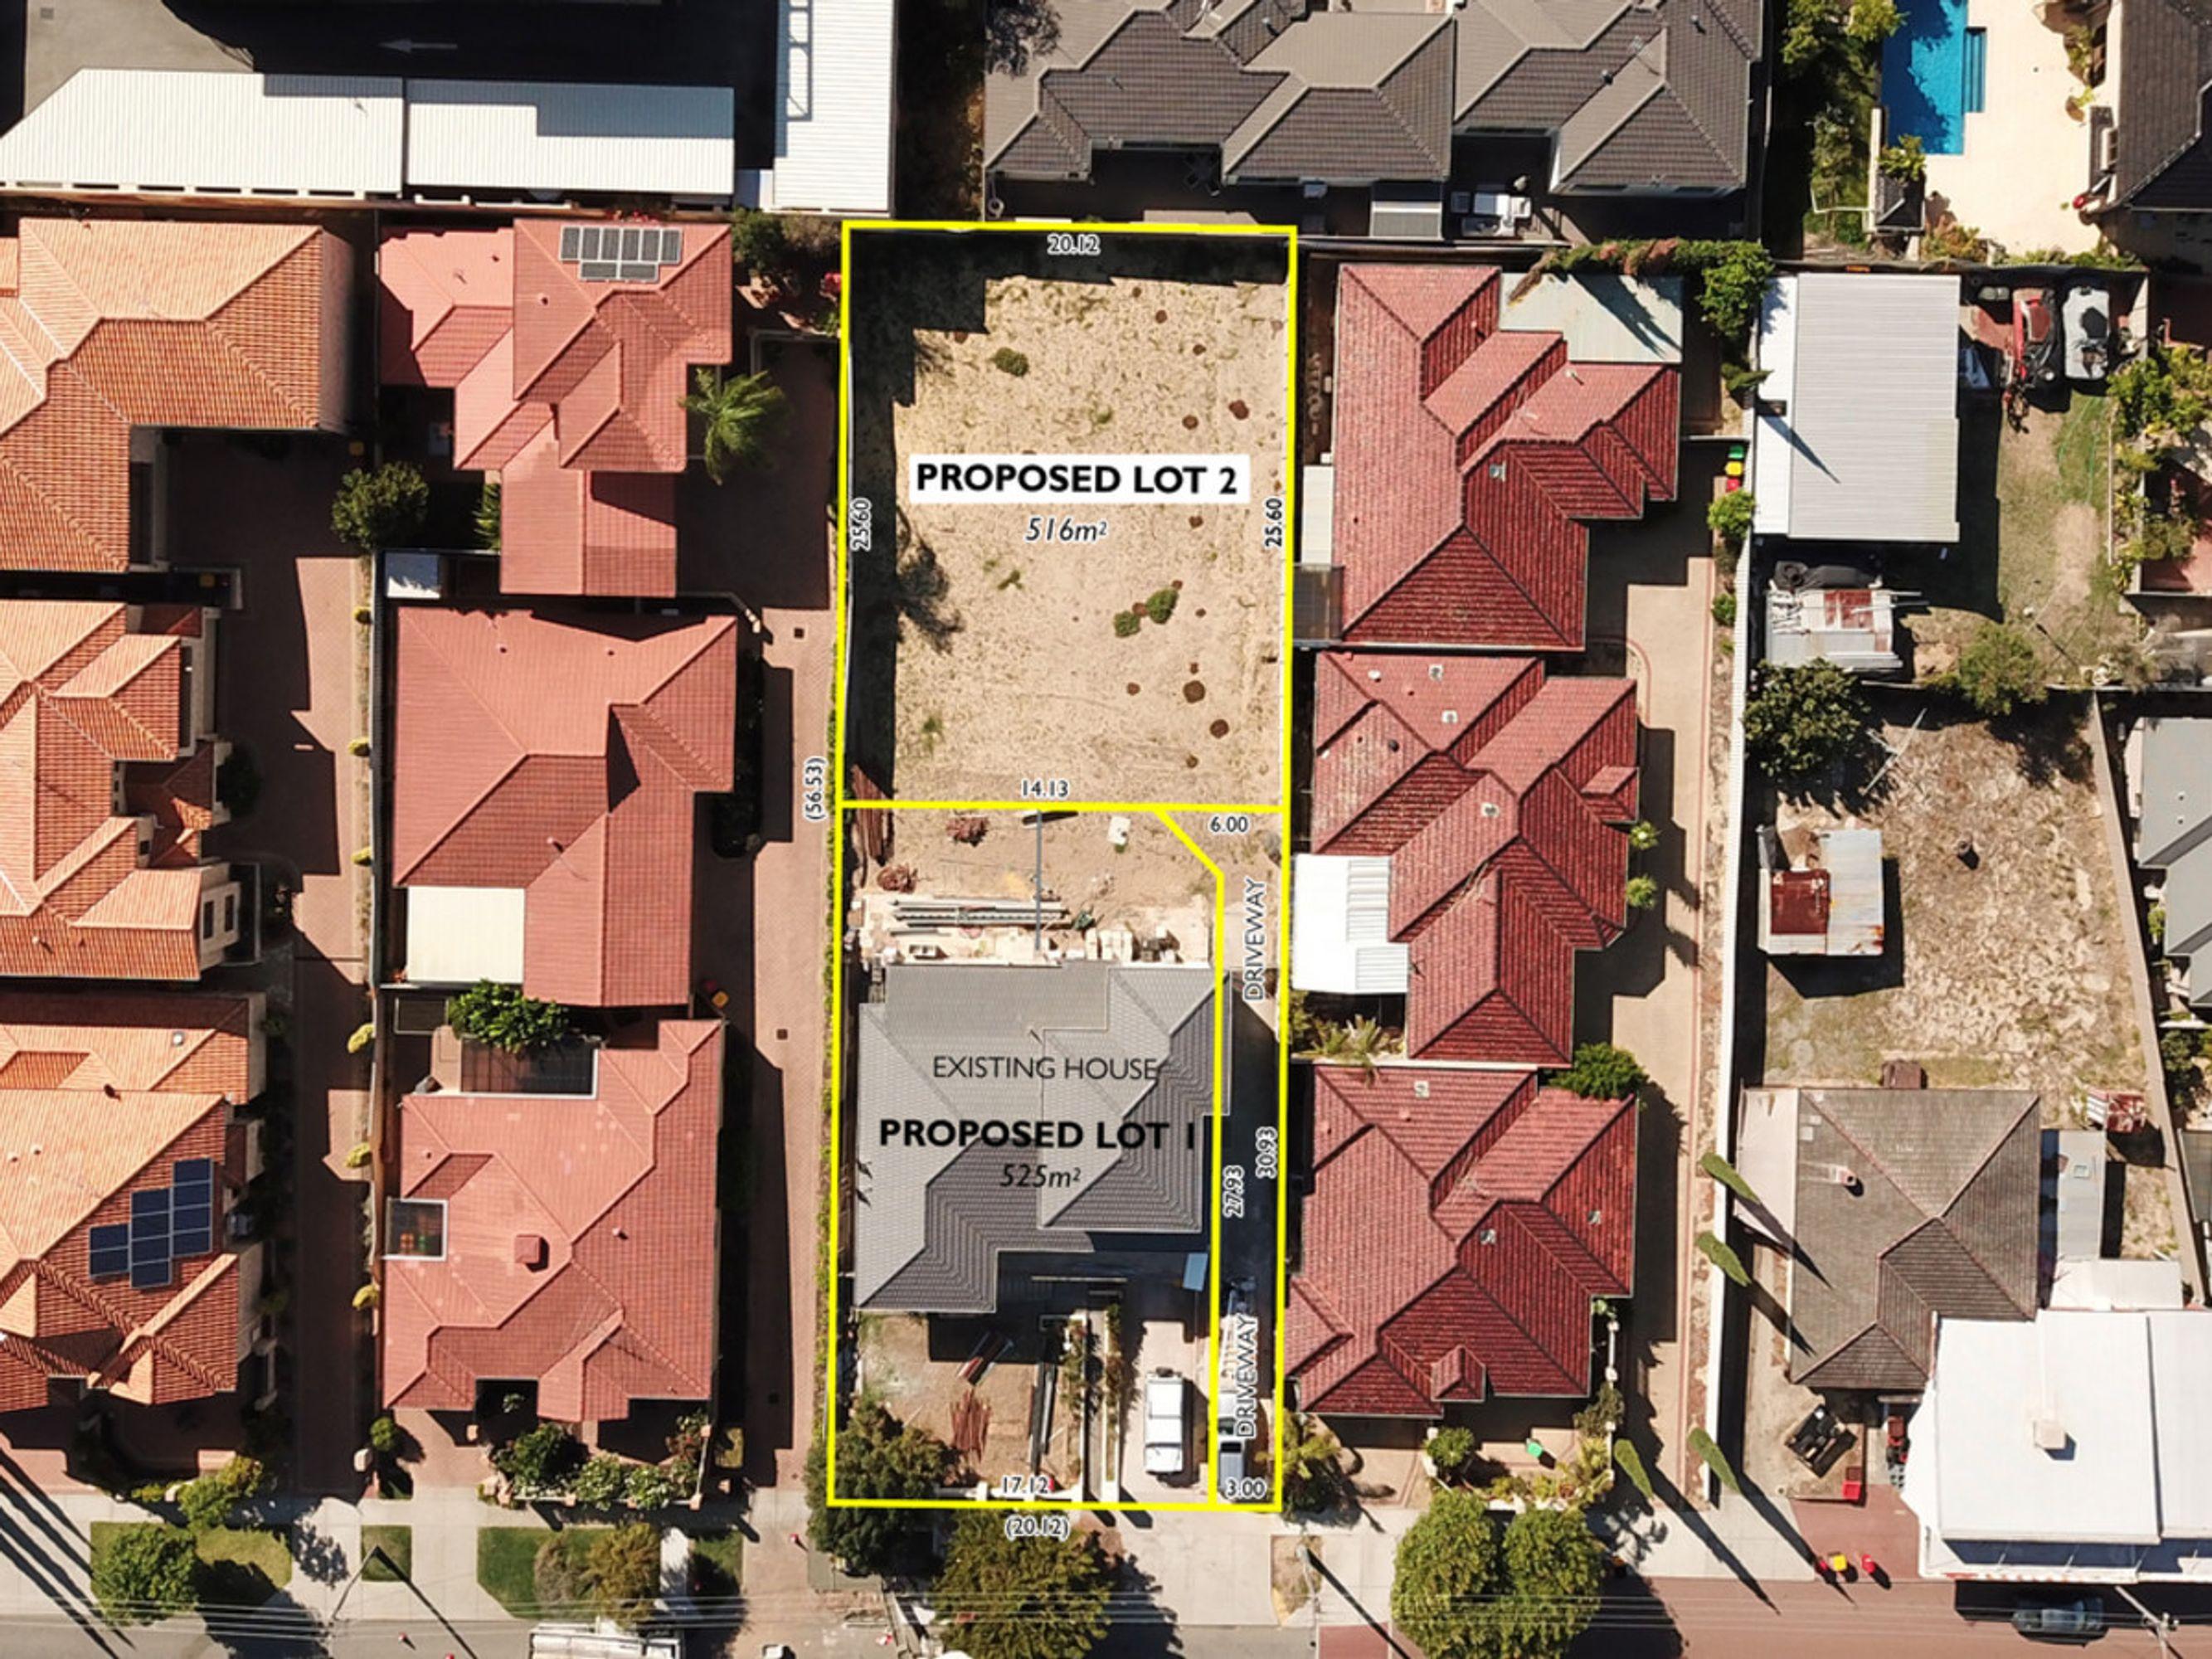 Proposed Lot 2 of 71 Powell Street, Joondanna, WA 6060